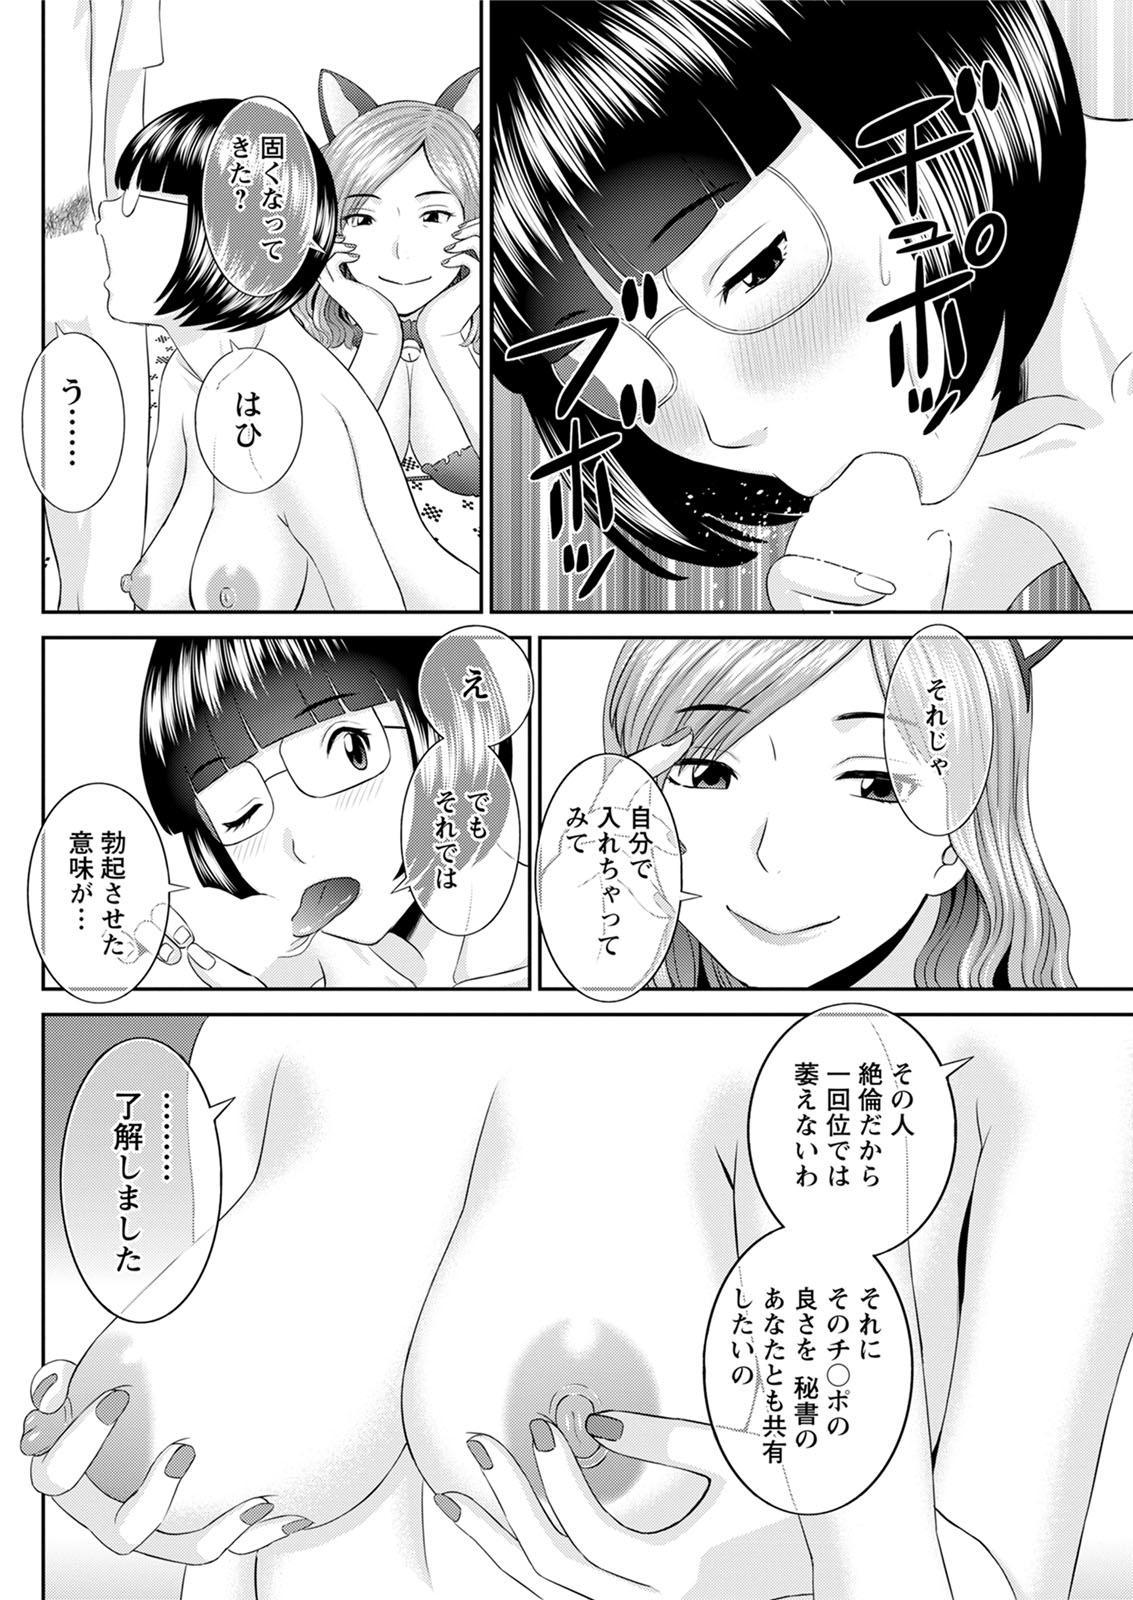 [Kawamori Misaki] Kaikan Hitotsuma Gakuen Ch. 1-6, 8-16 [Digital] 248